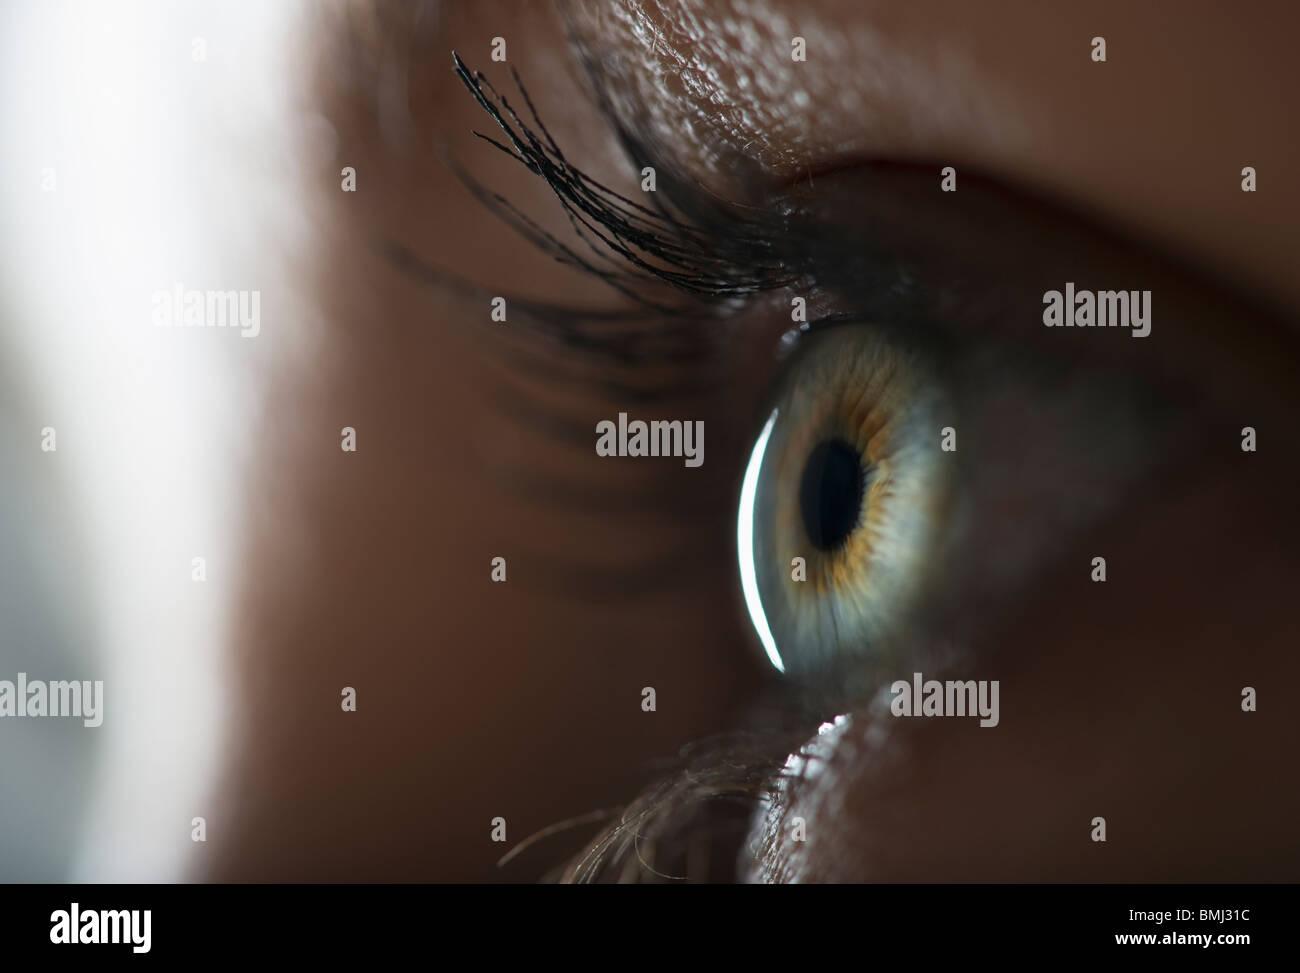 Ojo de mujer Imagen De Stock